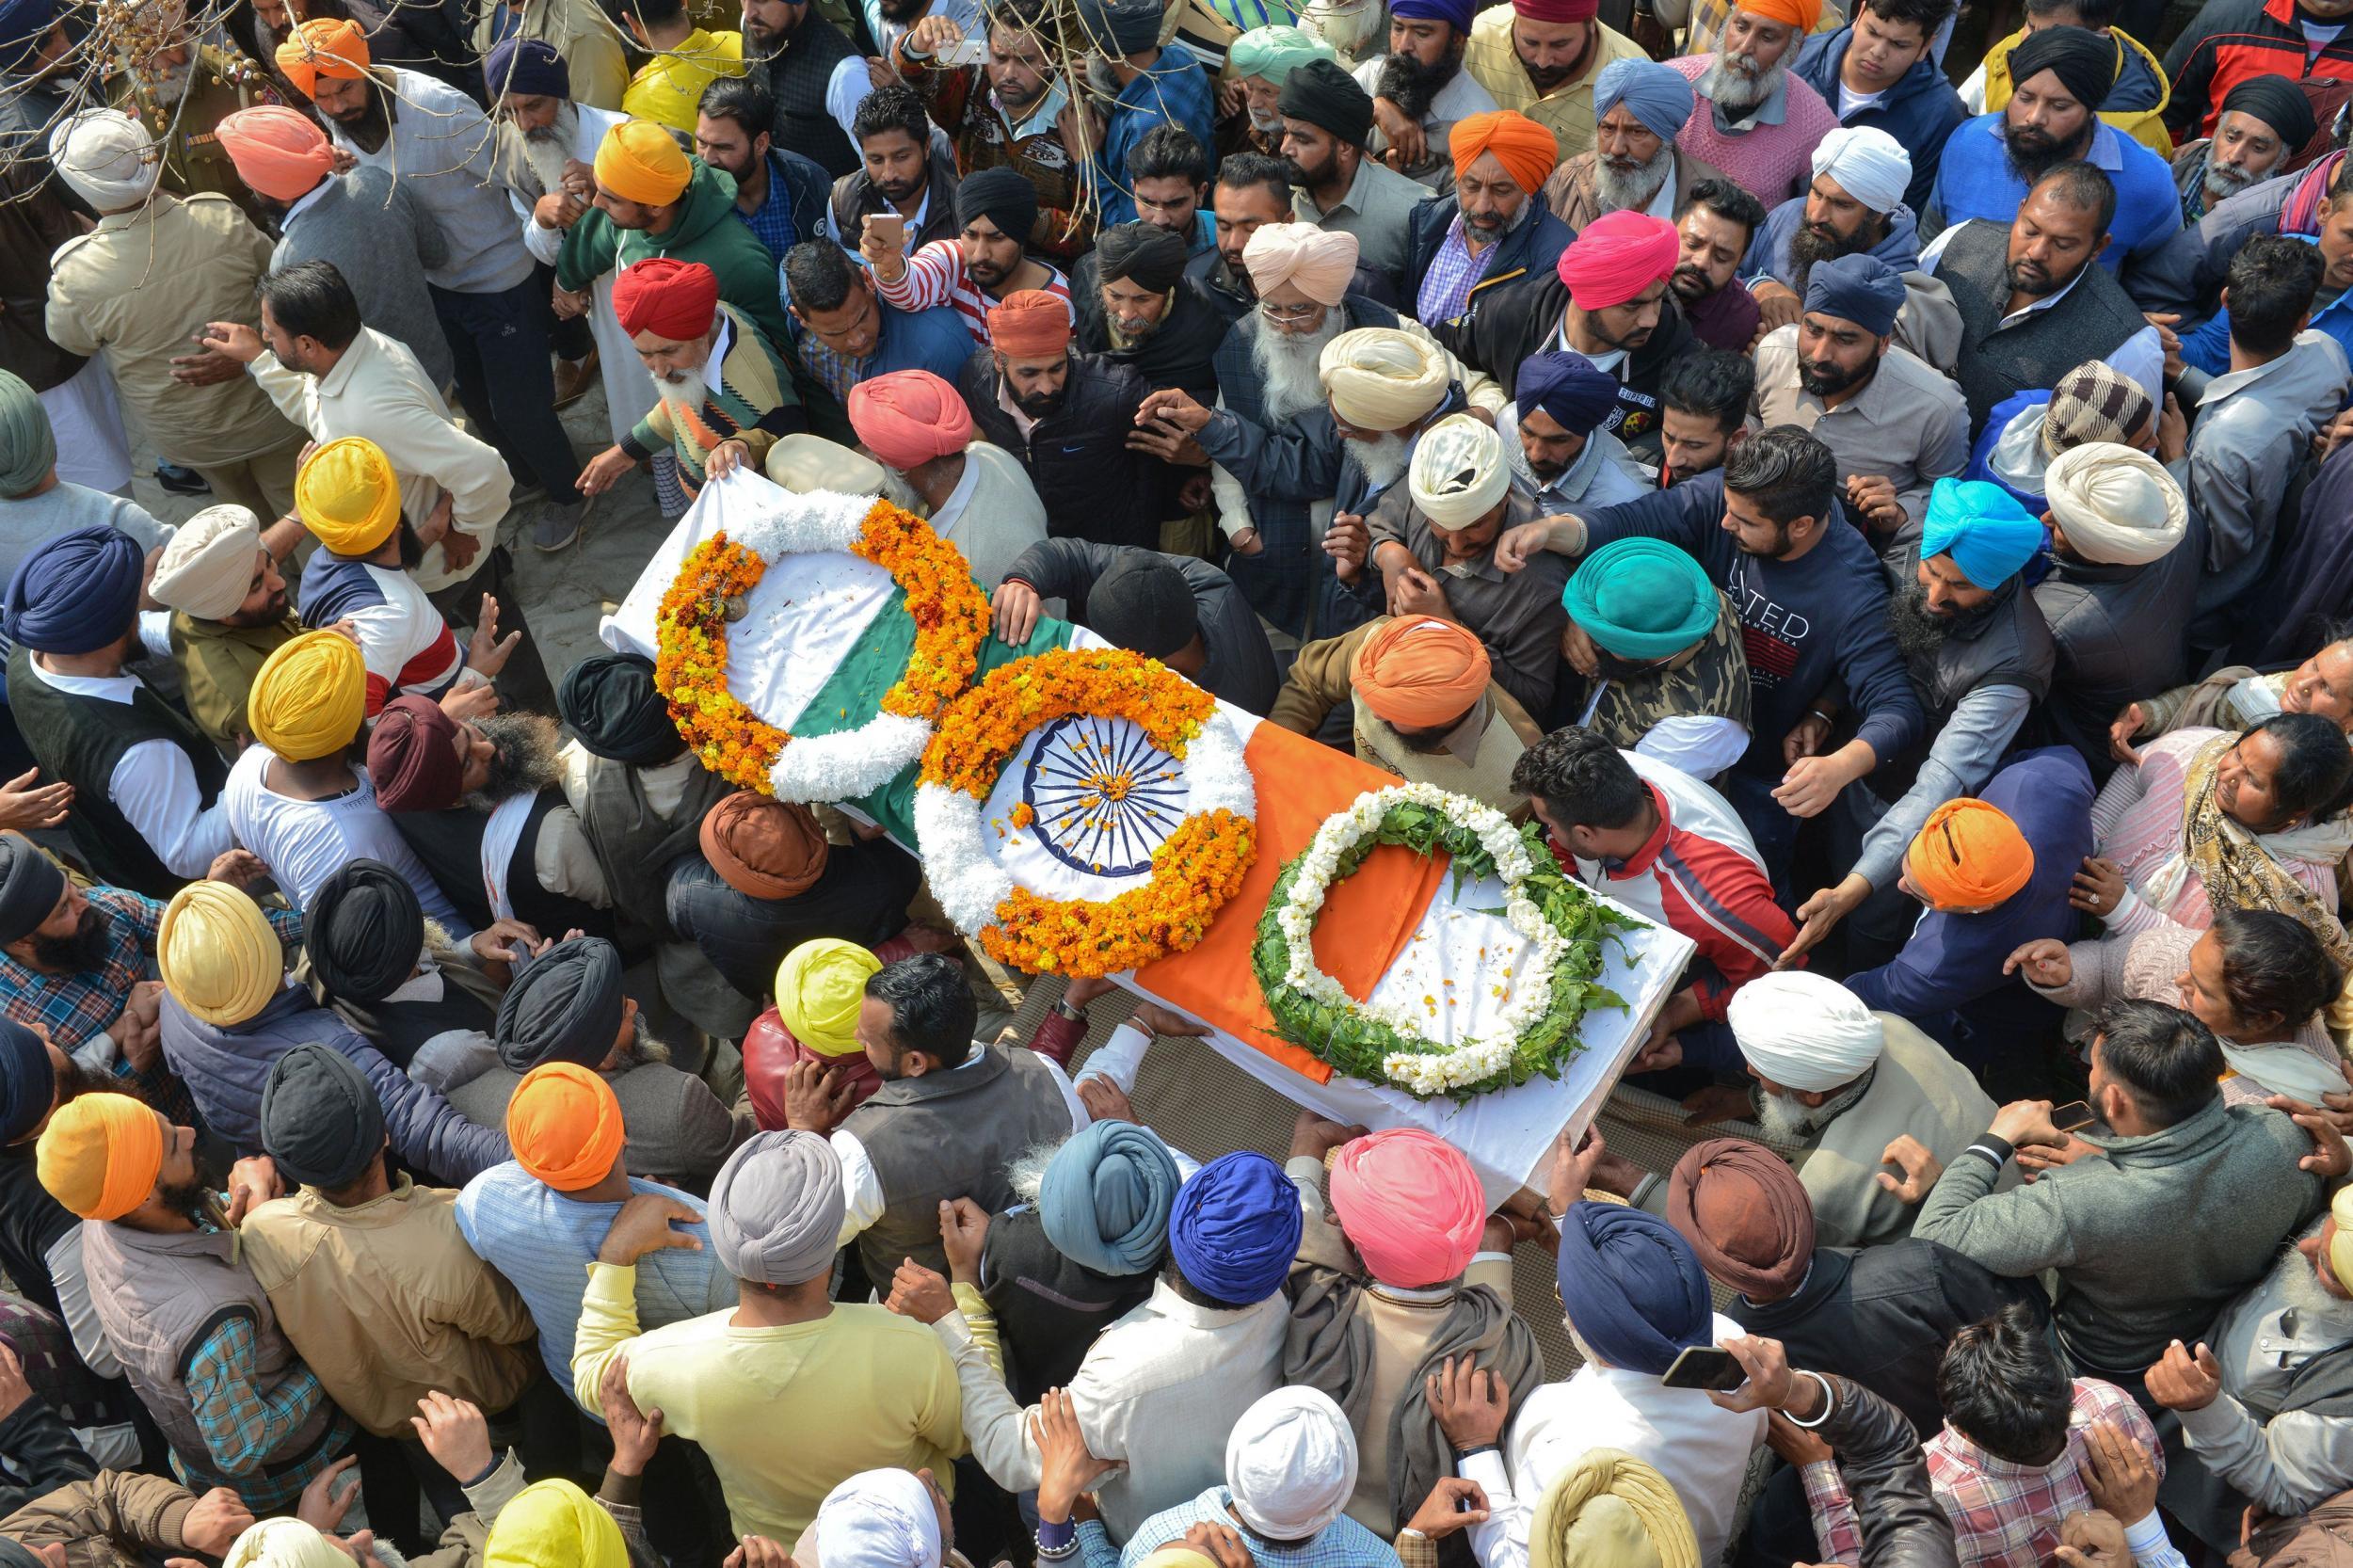 Masood Azhar: India wants Pakistan blacklisted after UN